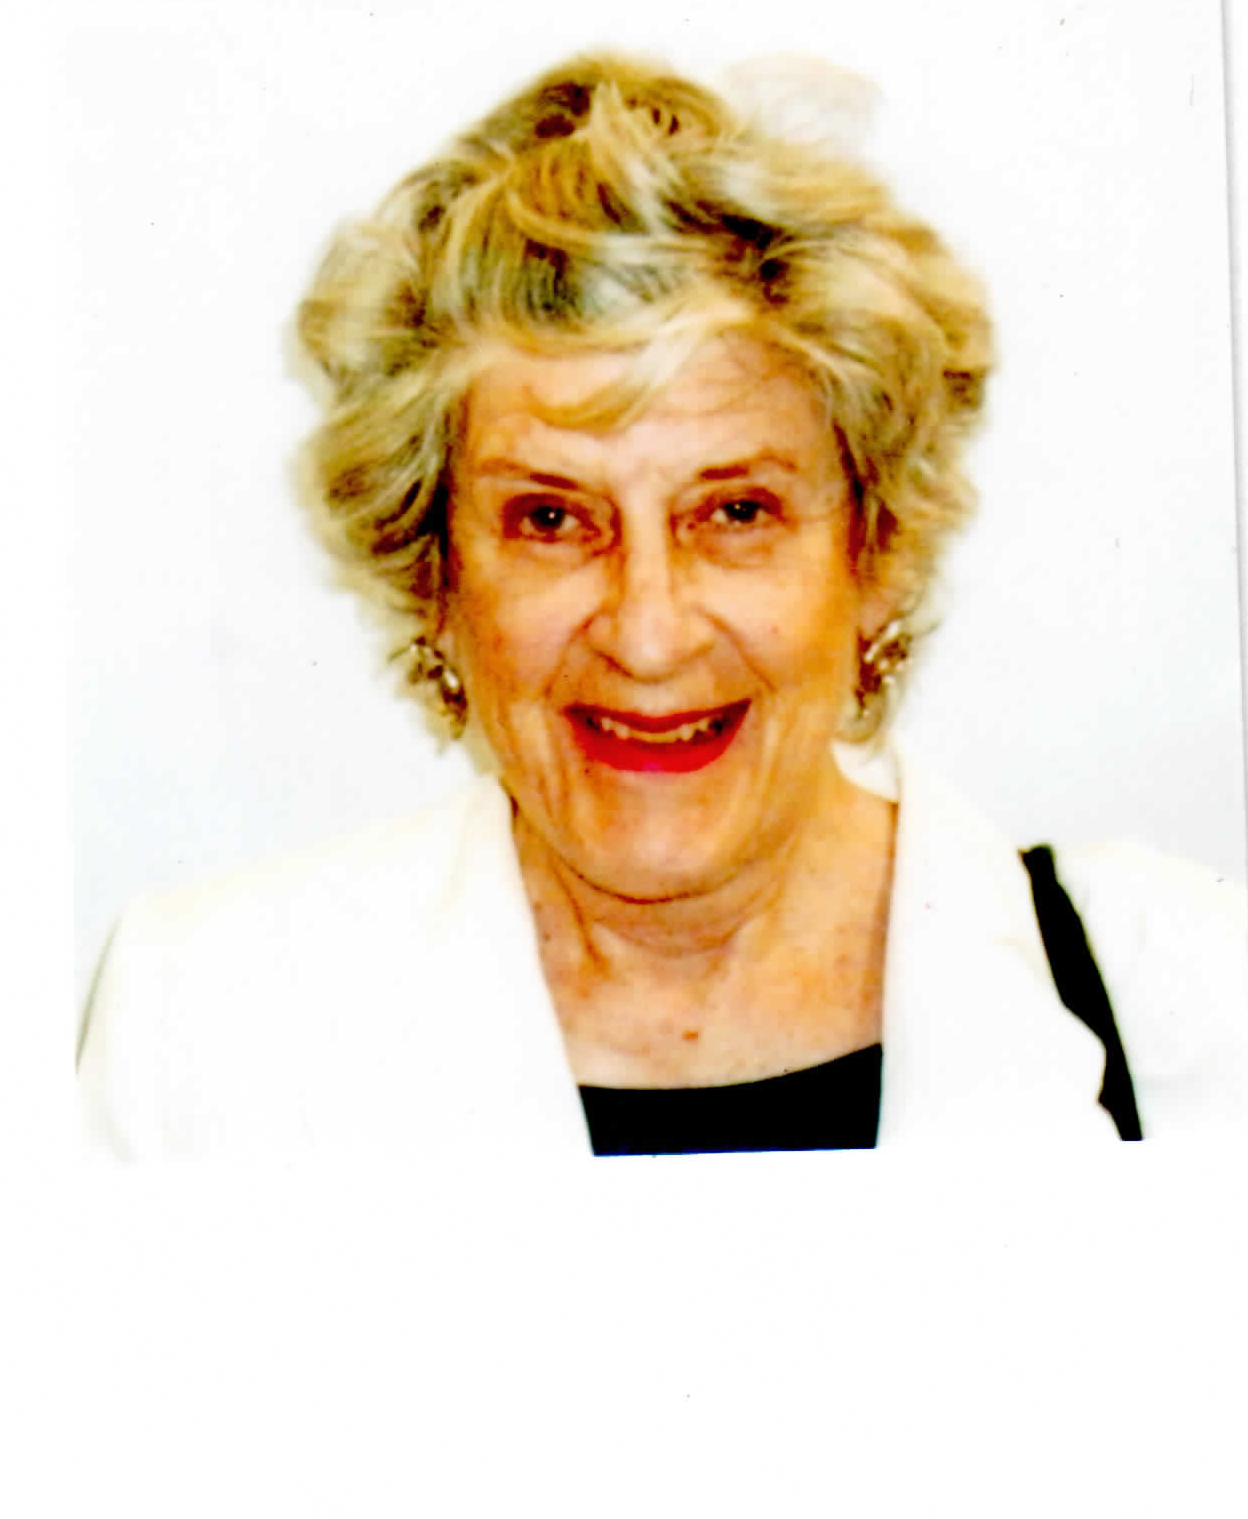 Suzanne Roffler-Tarlov, Ph.D.